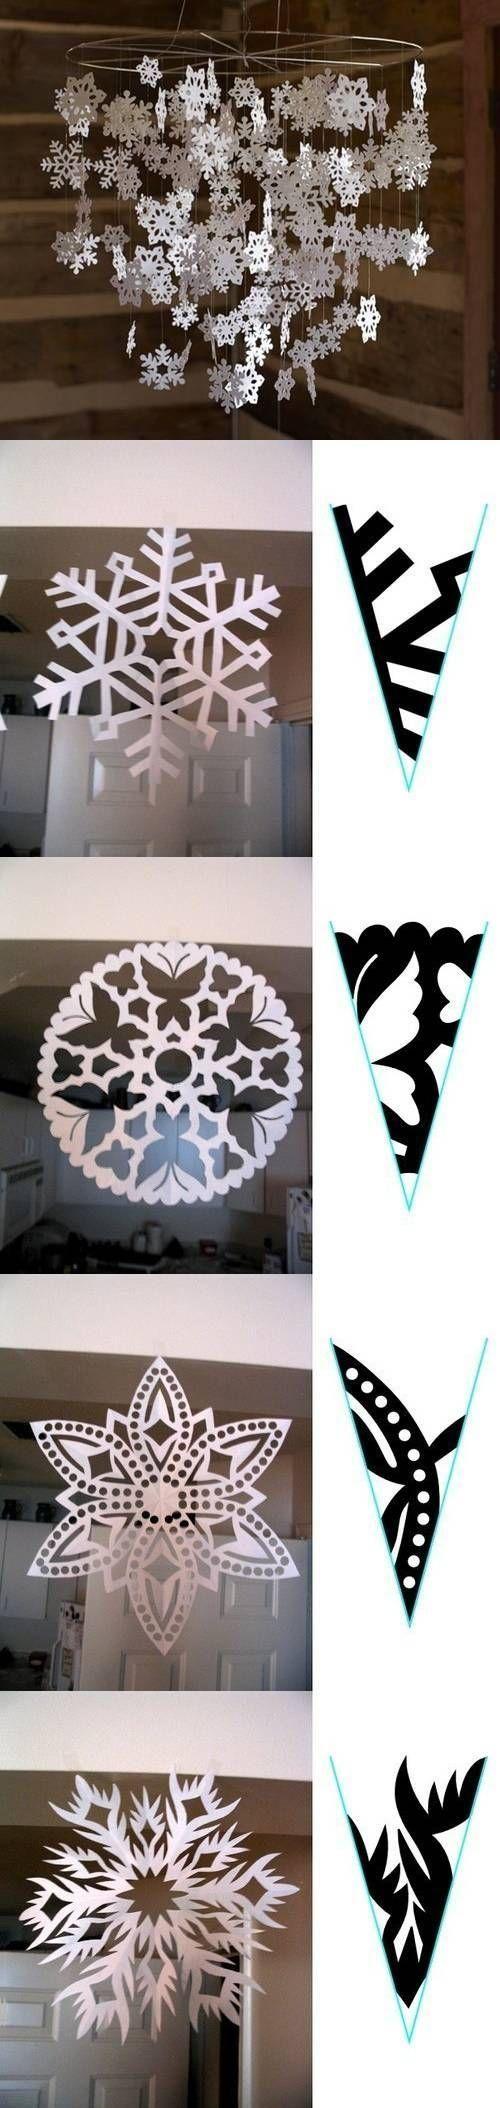 paper snowflakes//